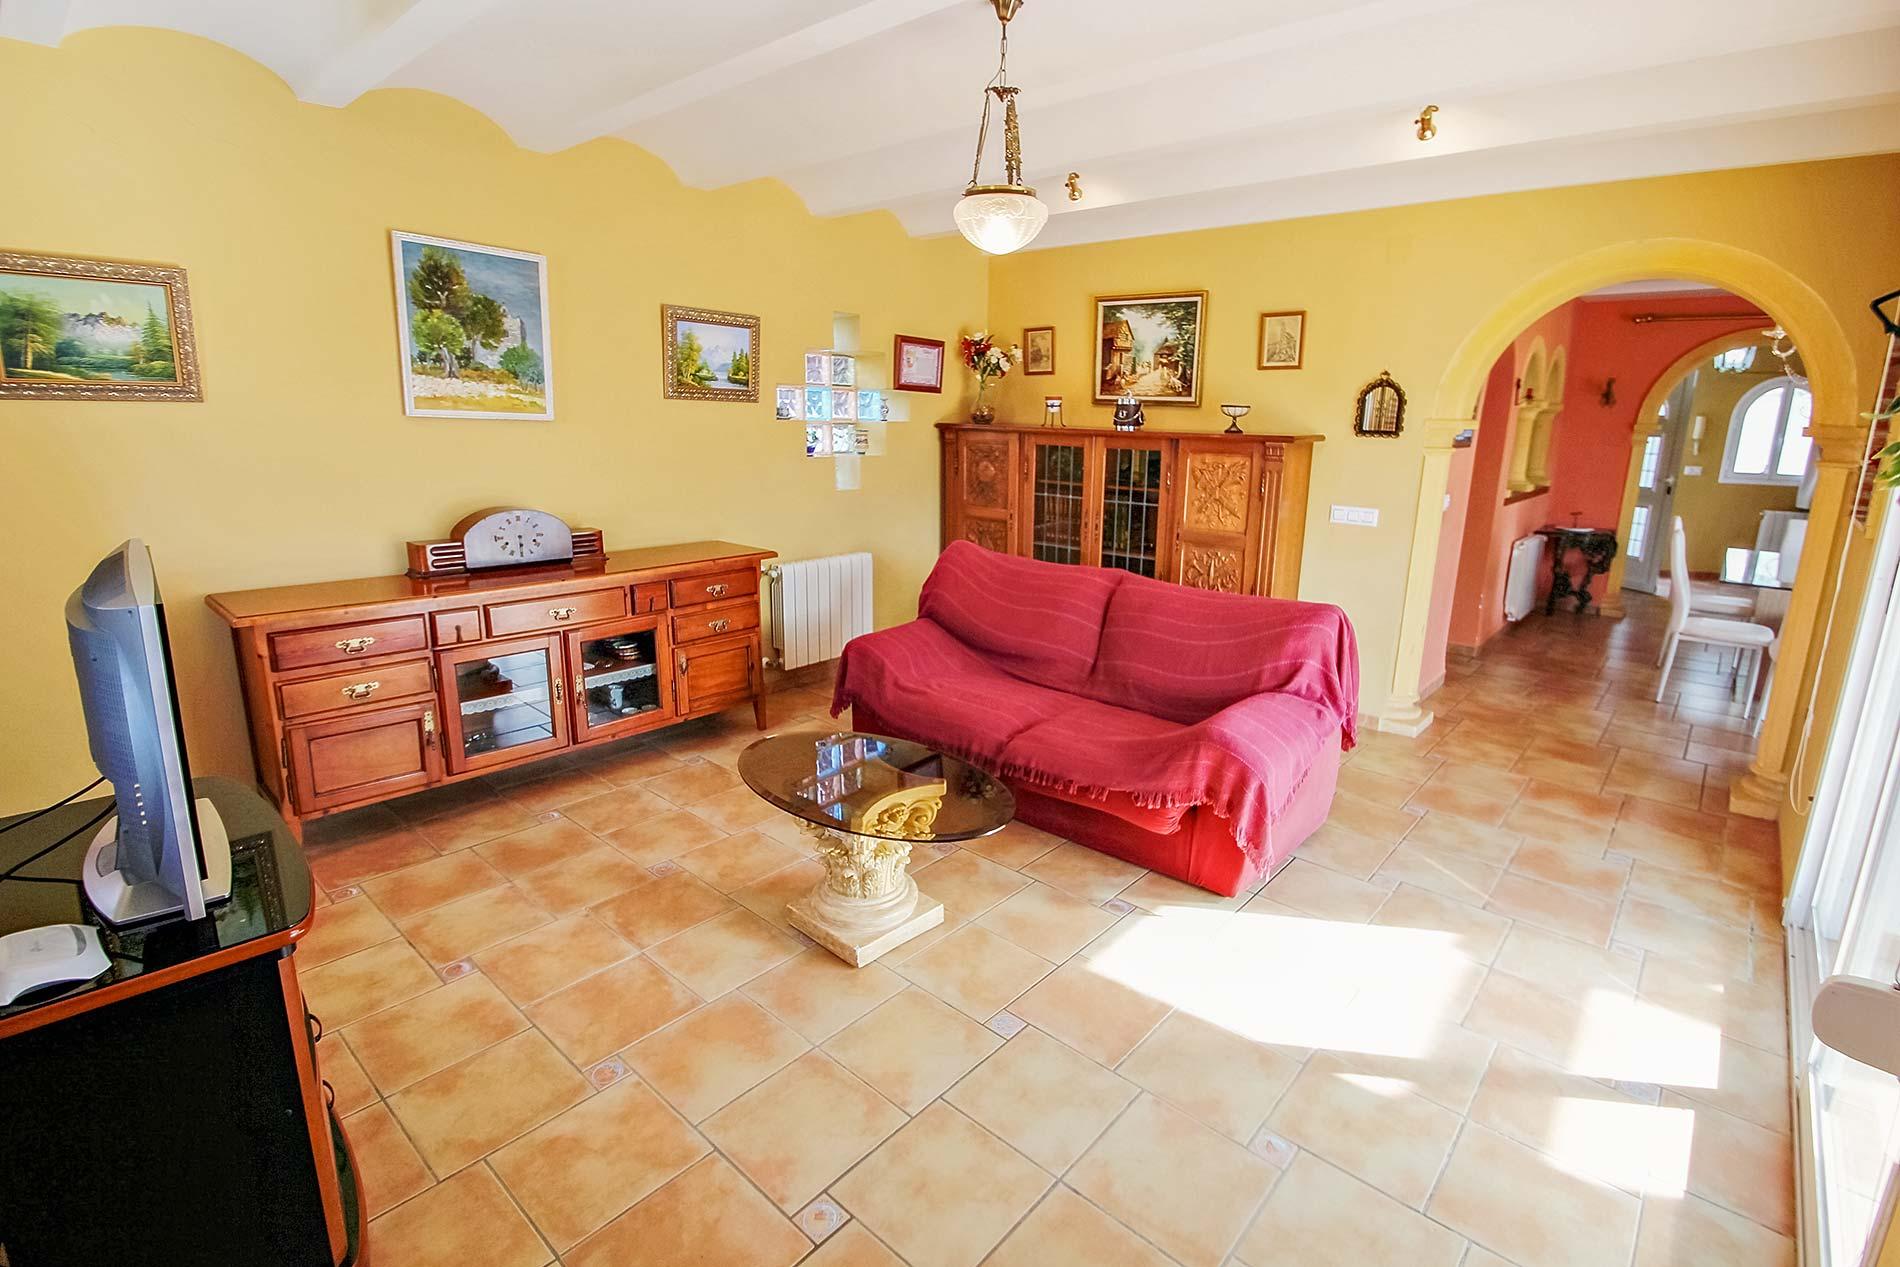 Villa Doble in Calpe - sleeps 8 people